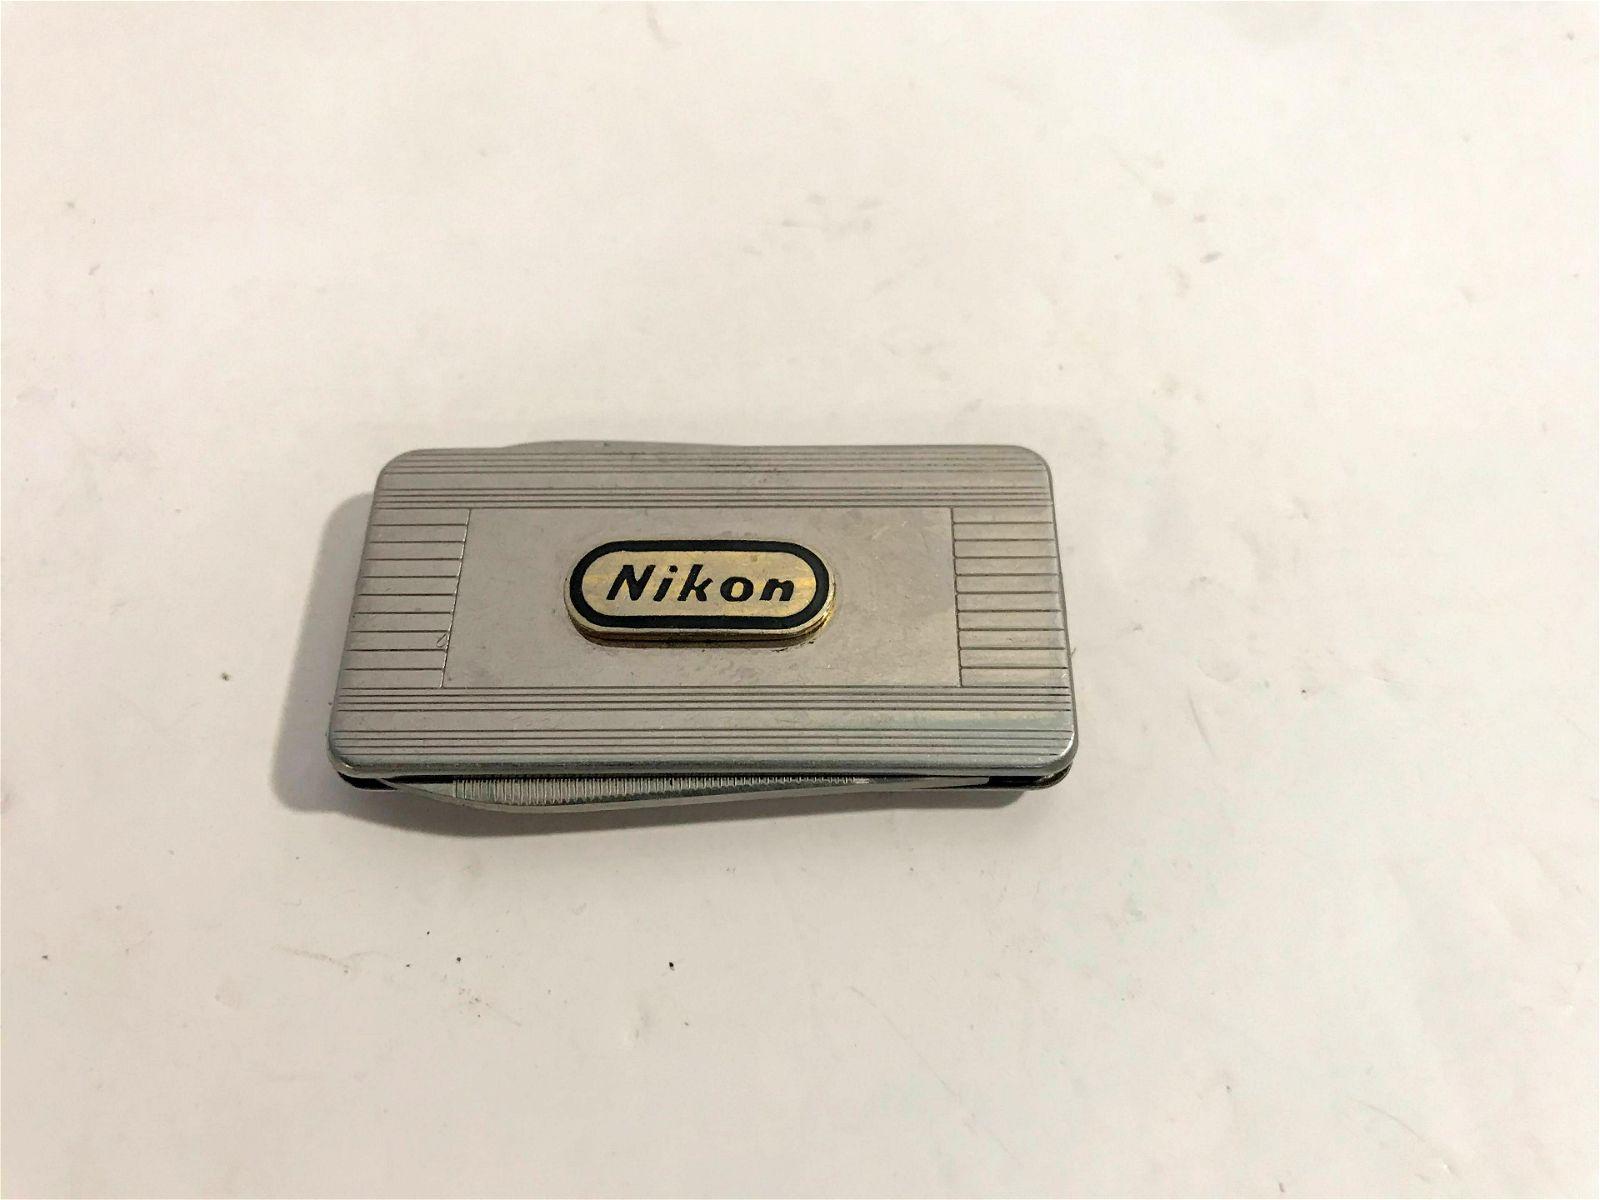 Vintage Nikon Folding Pocket Knife